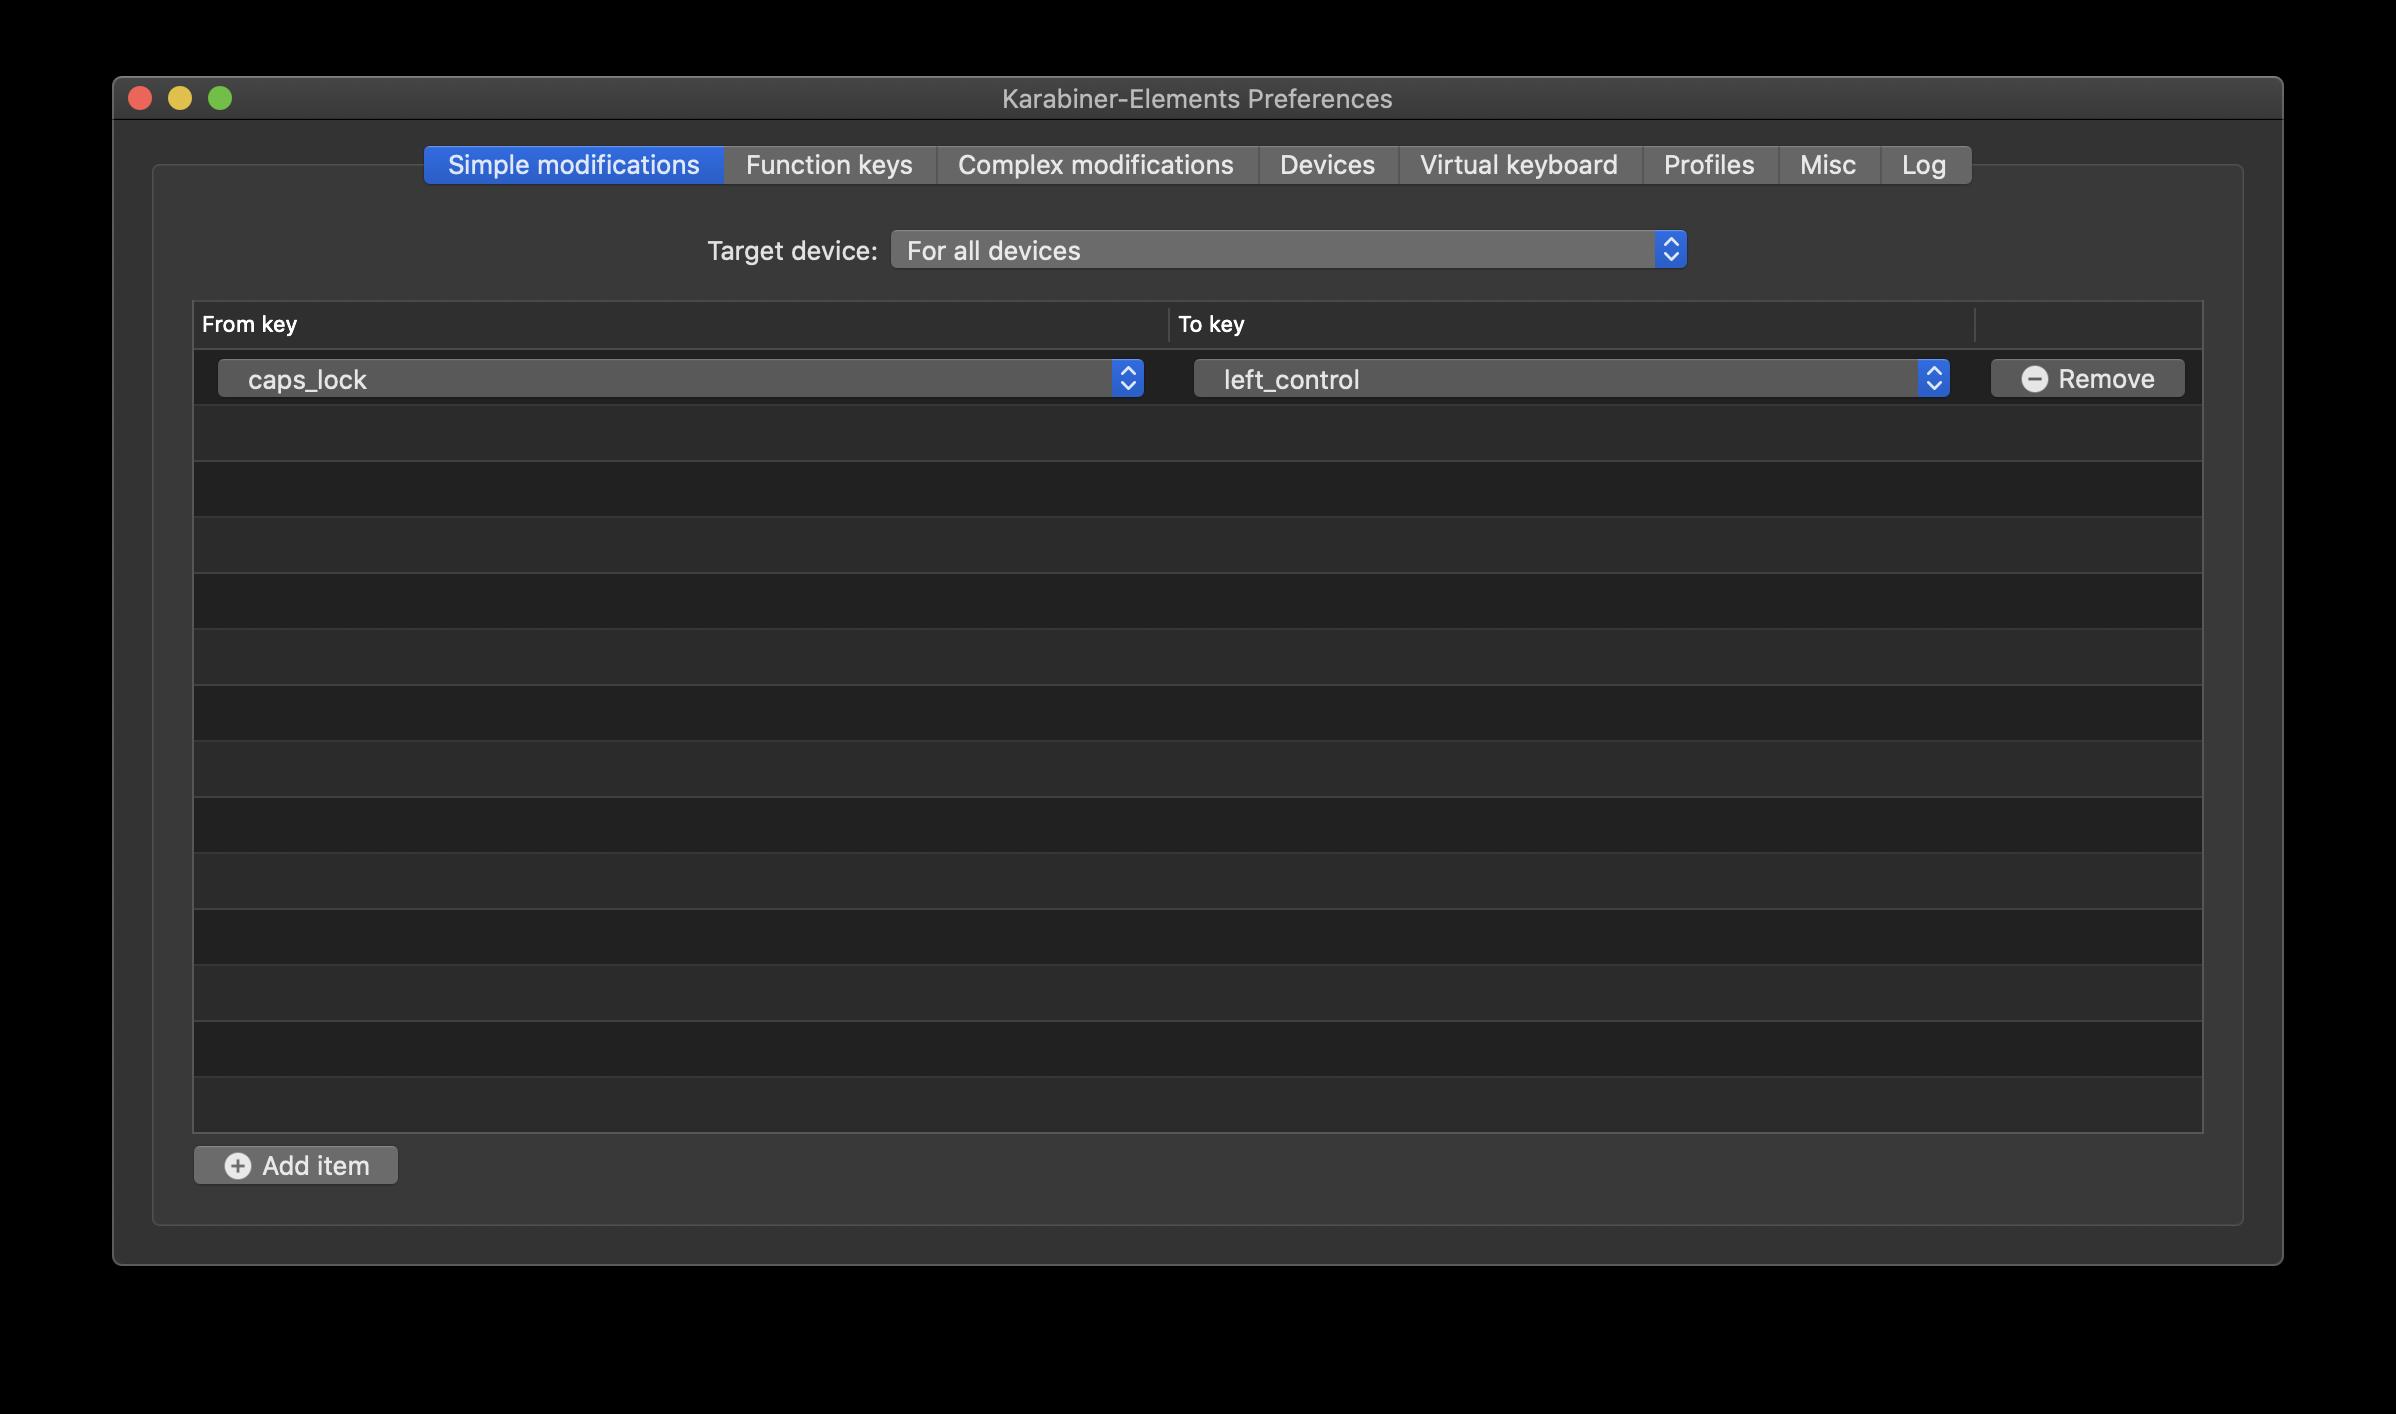 Karabiner-Elementsの設定画面